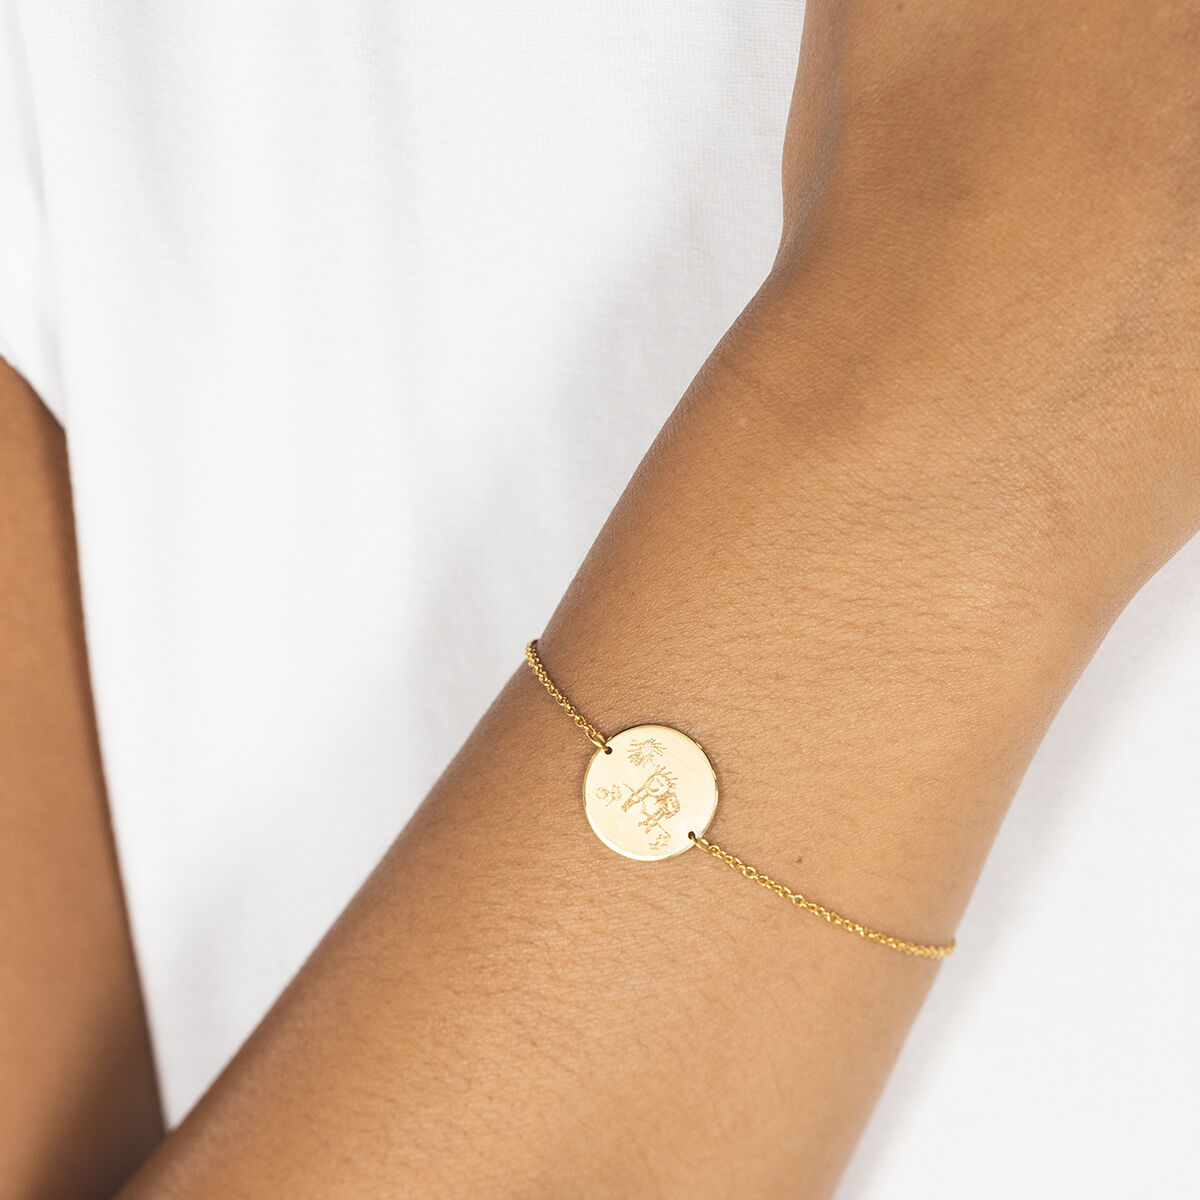 Signature Coin Bracelet